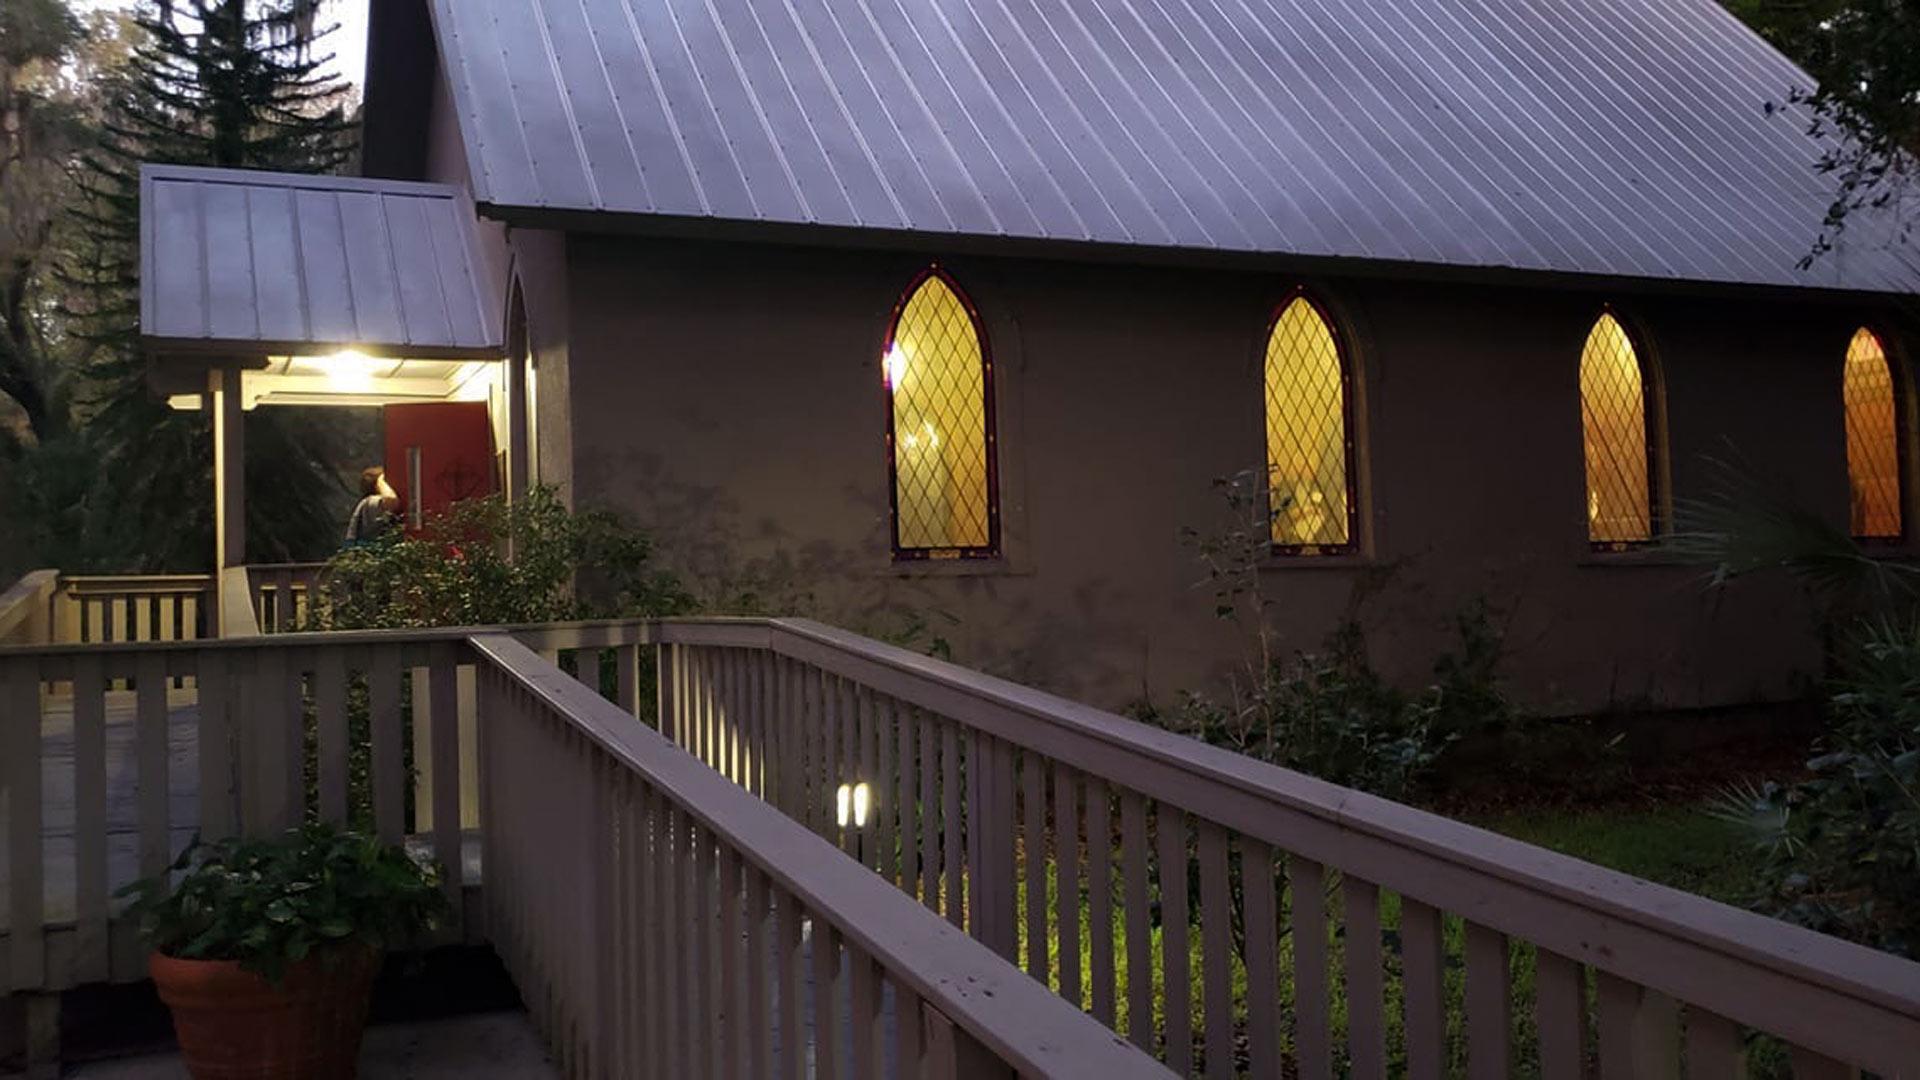 parrish-episcopal-church-photo-03